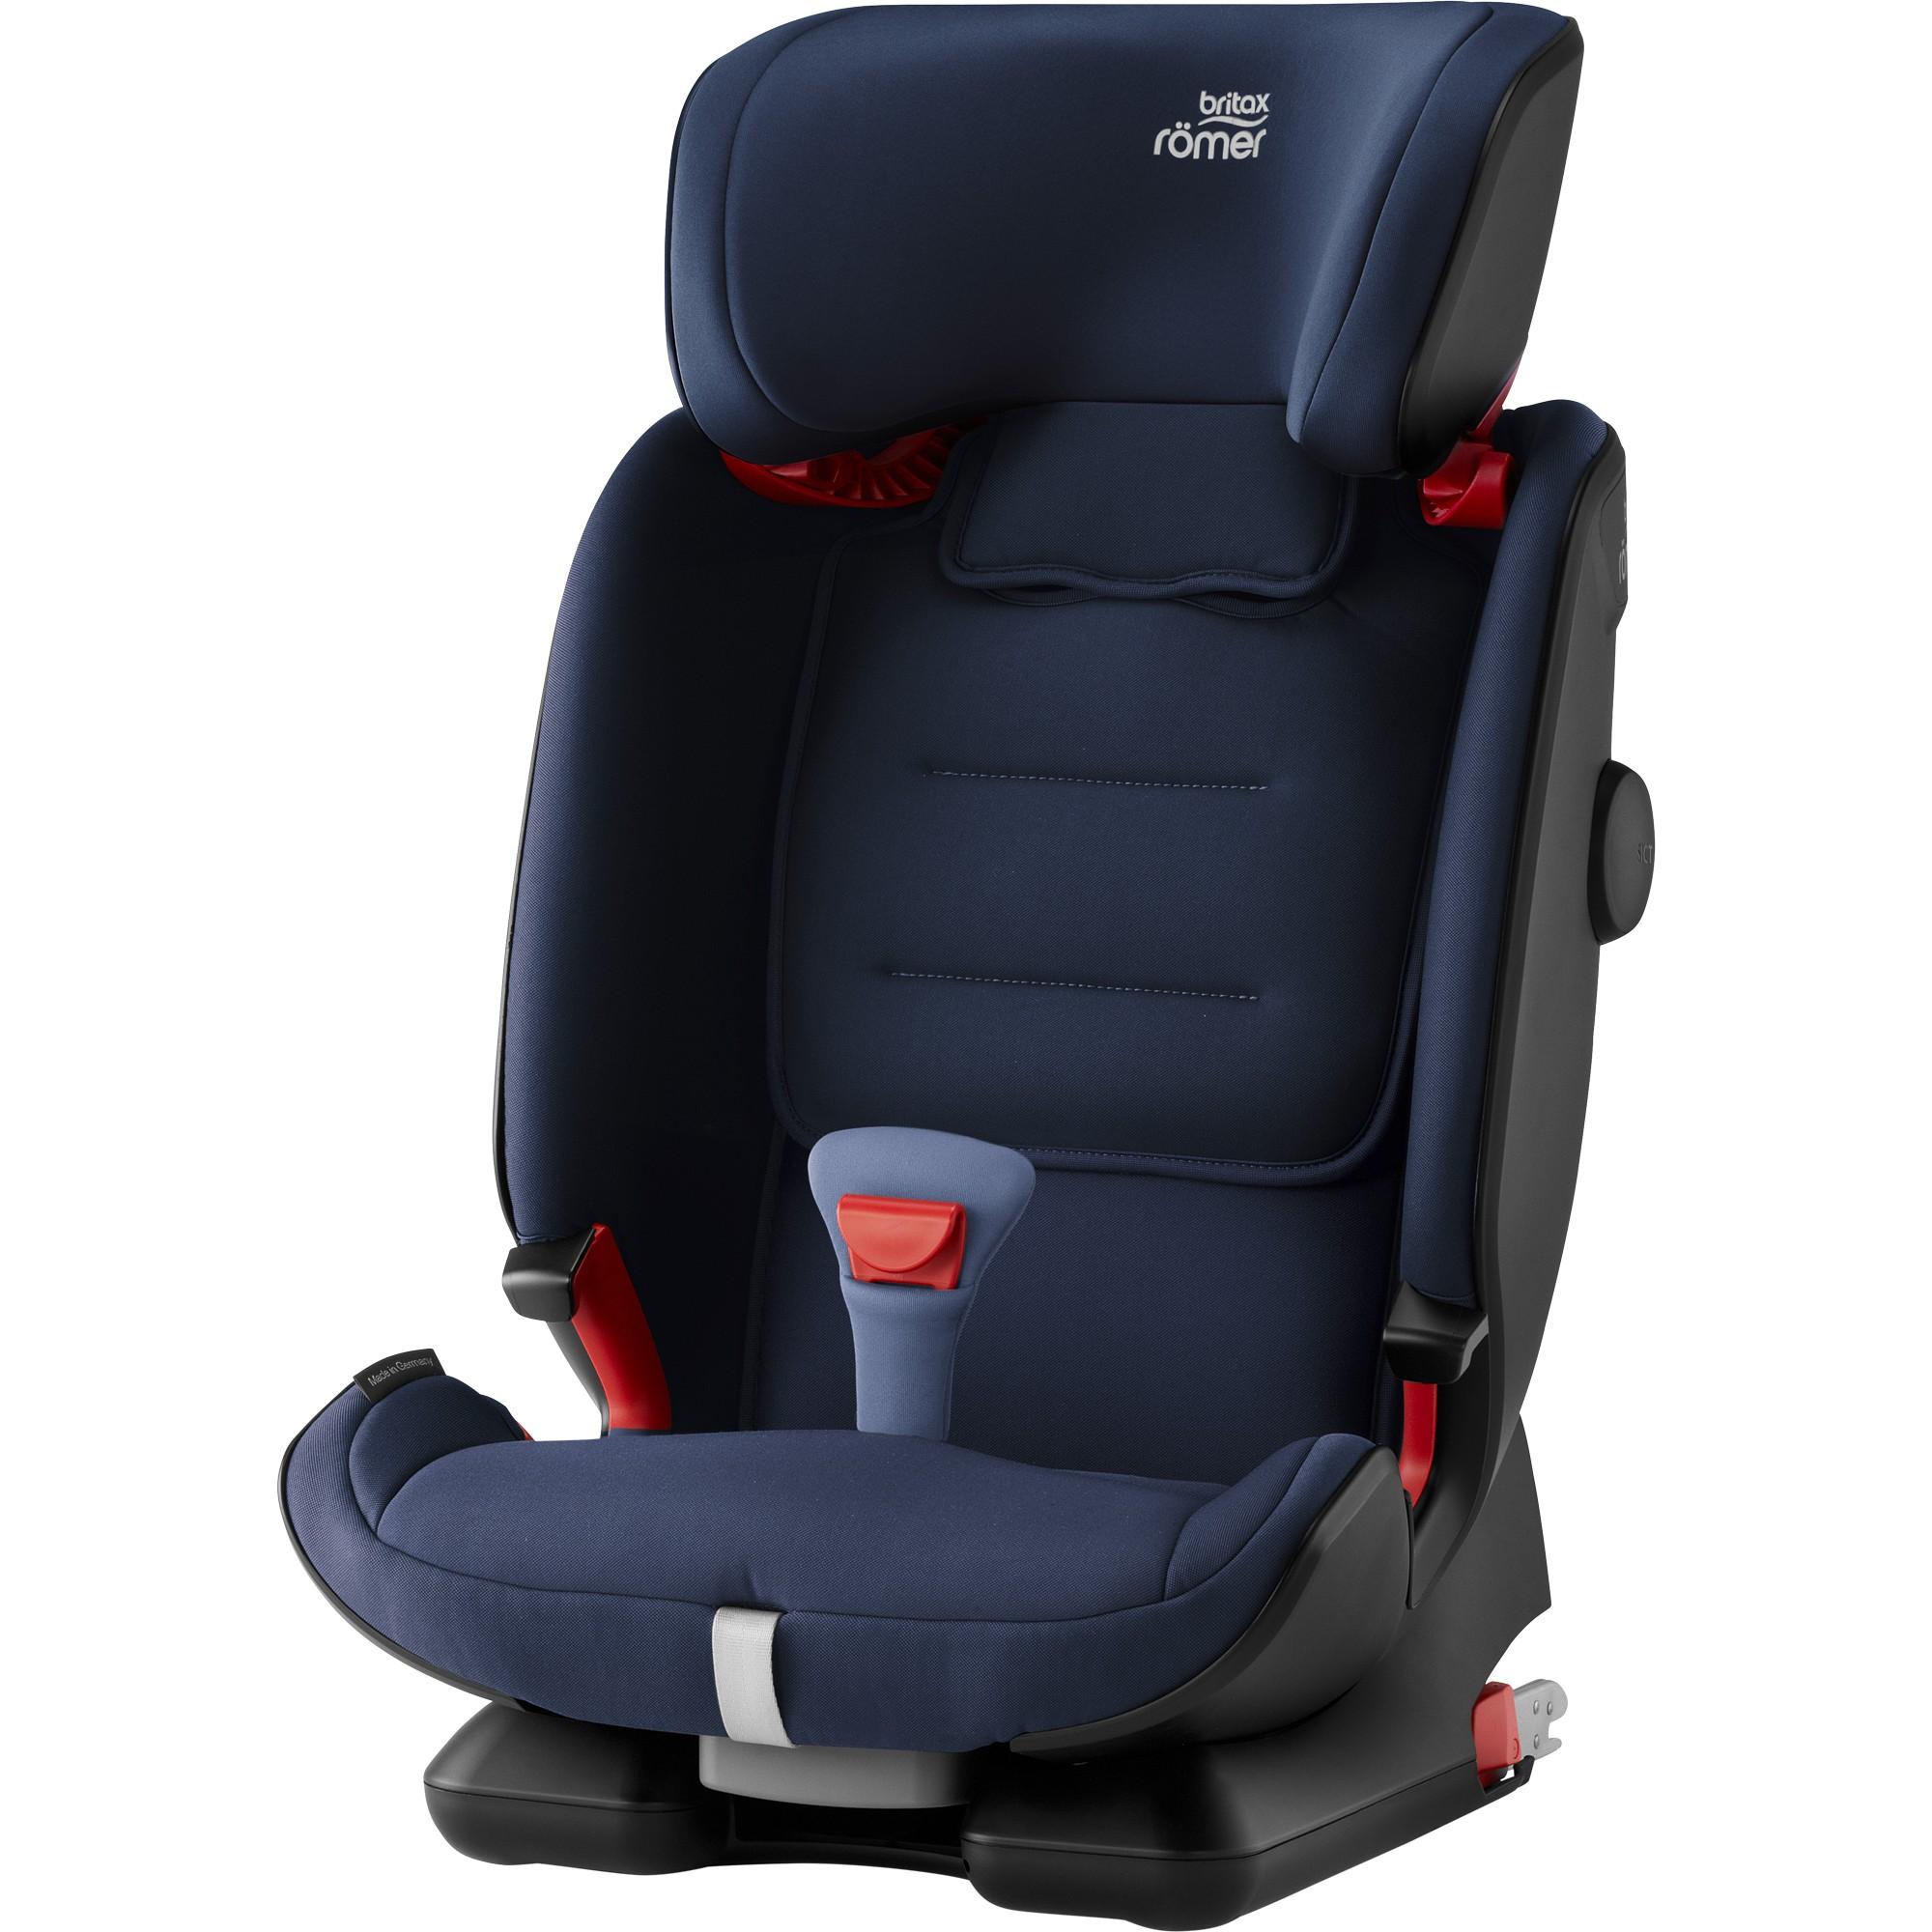 Britax-Romer-ADVANSAFIX-IV-R-Group-1-2-3-Child-Car-Seat thumbnail 4